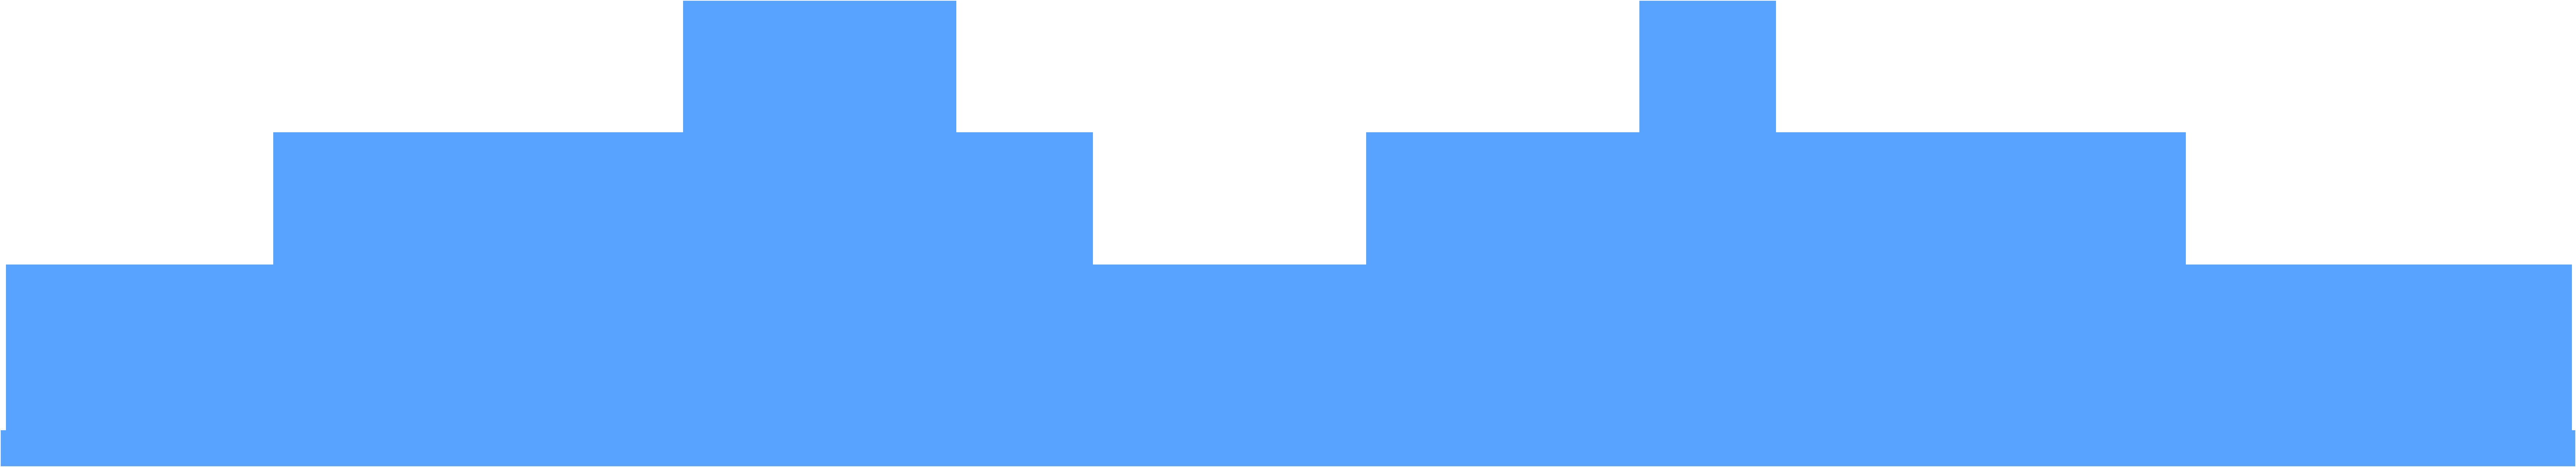 Footer skyline